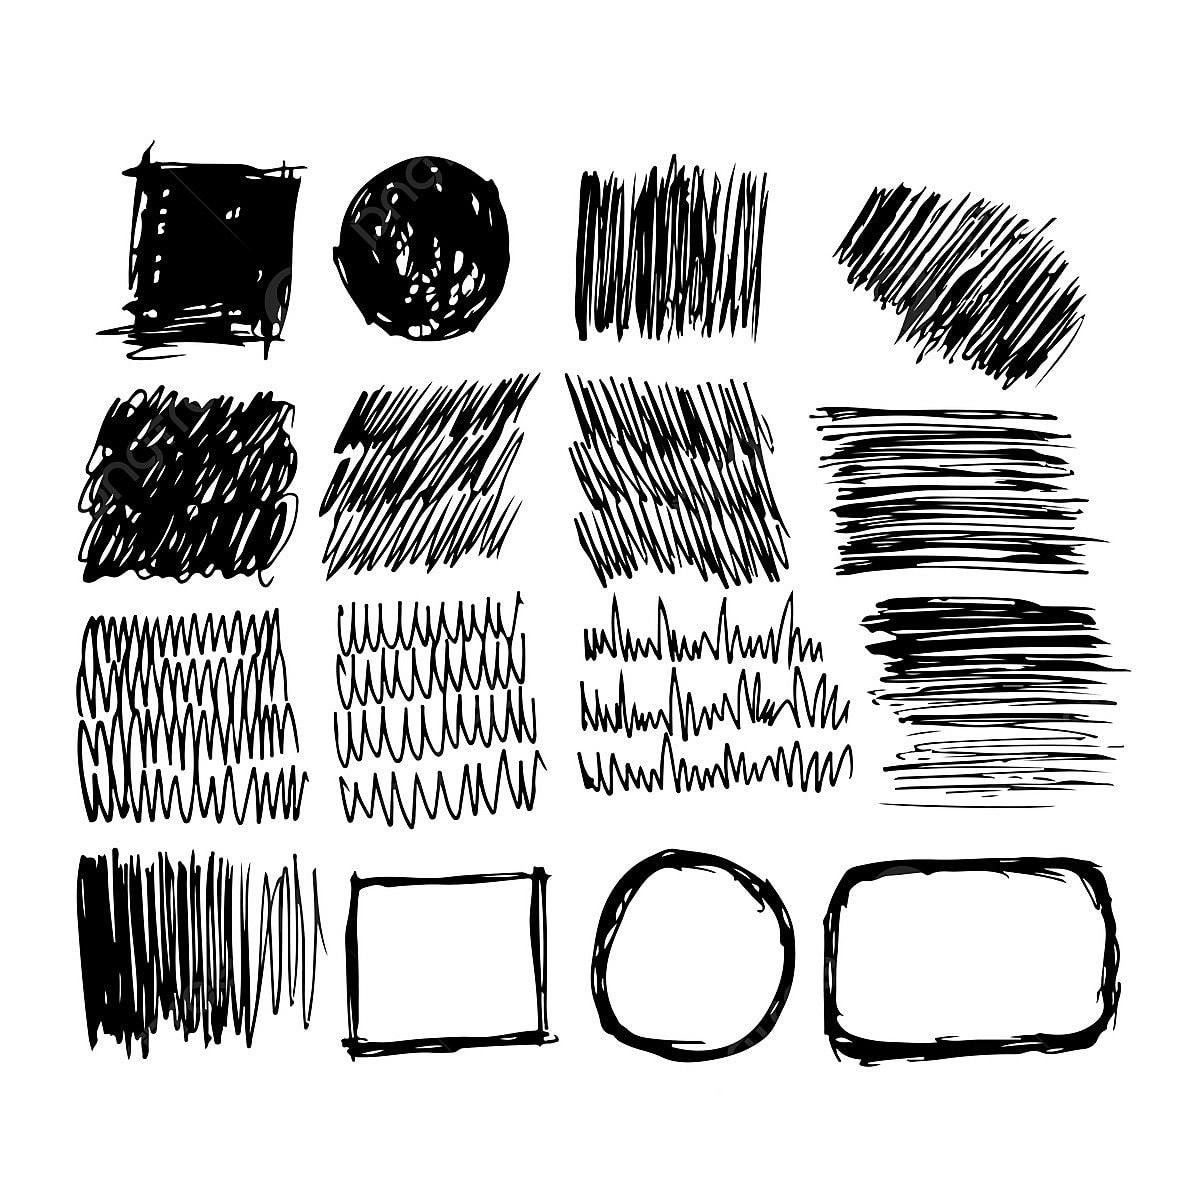 Tangan Ditarik Dakwat Sketsa Garis Abstrak Seni Seni PNG